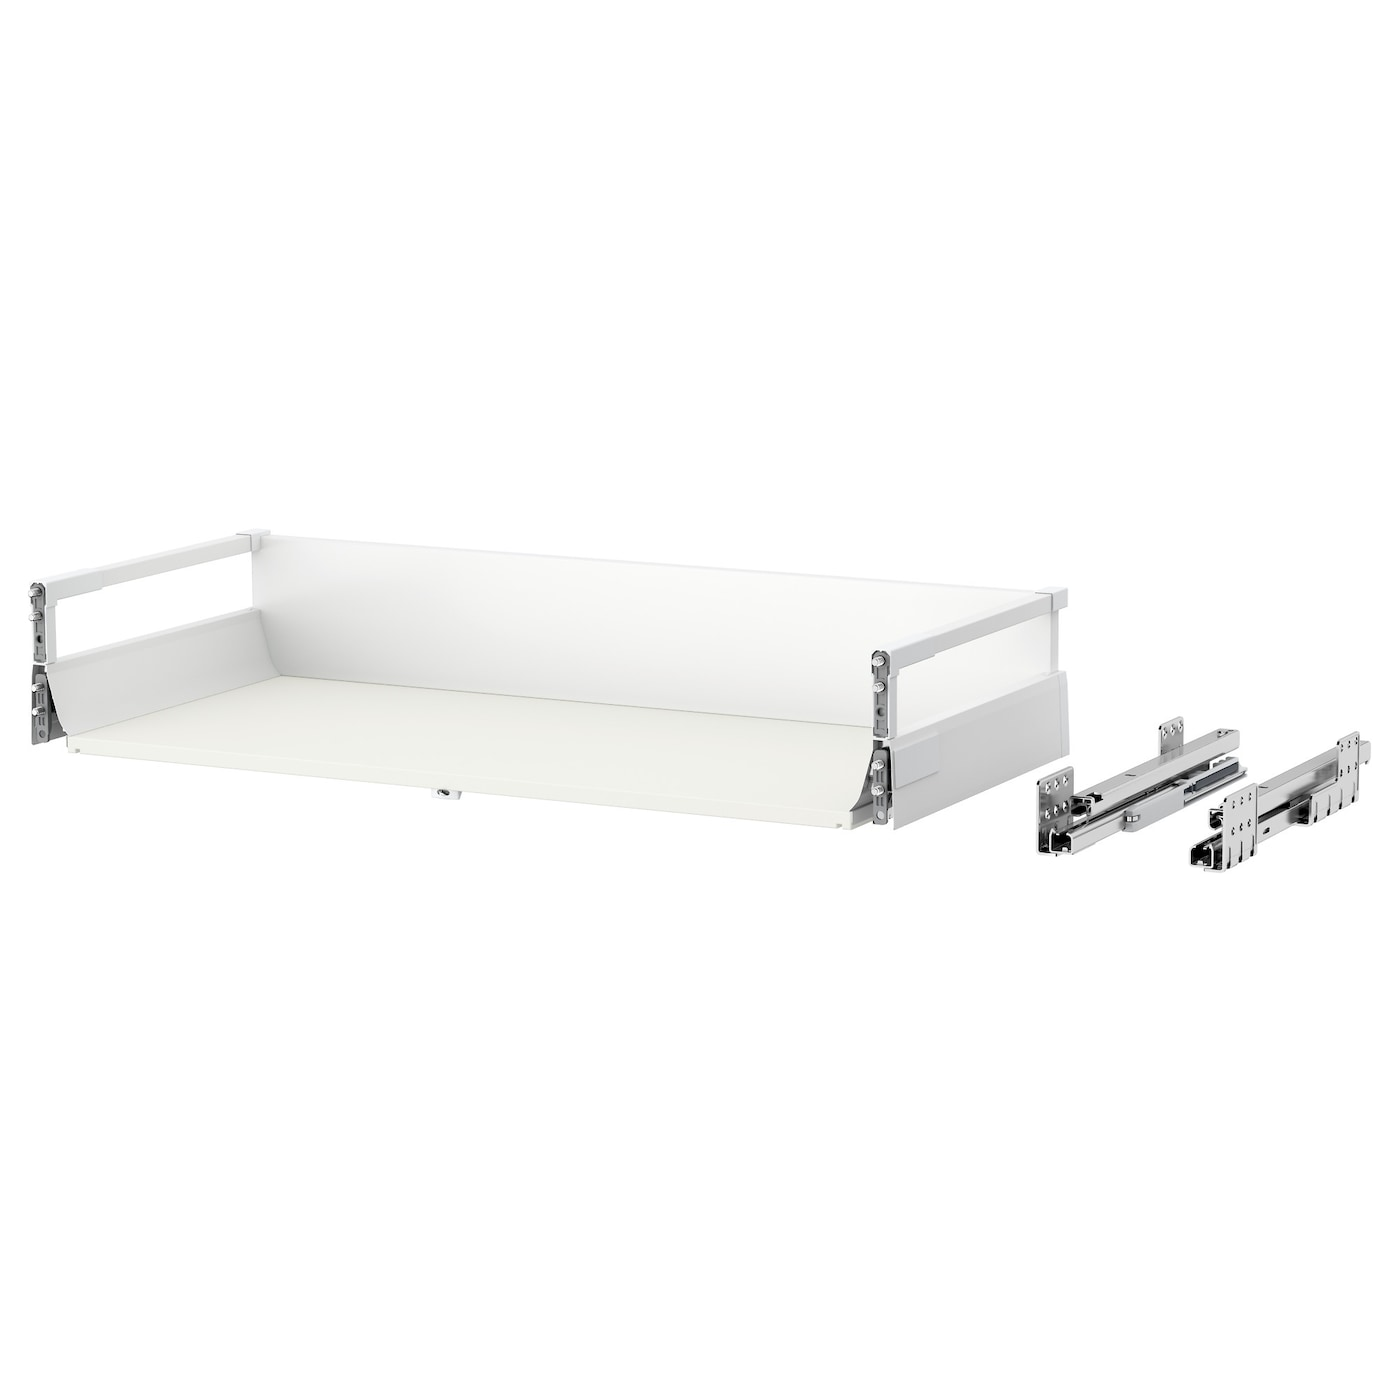 maximera tiroir moyen blanc 80x37 cm ikea. Black Bedroom Furniture Sets. Home Design Ideas